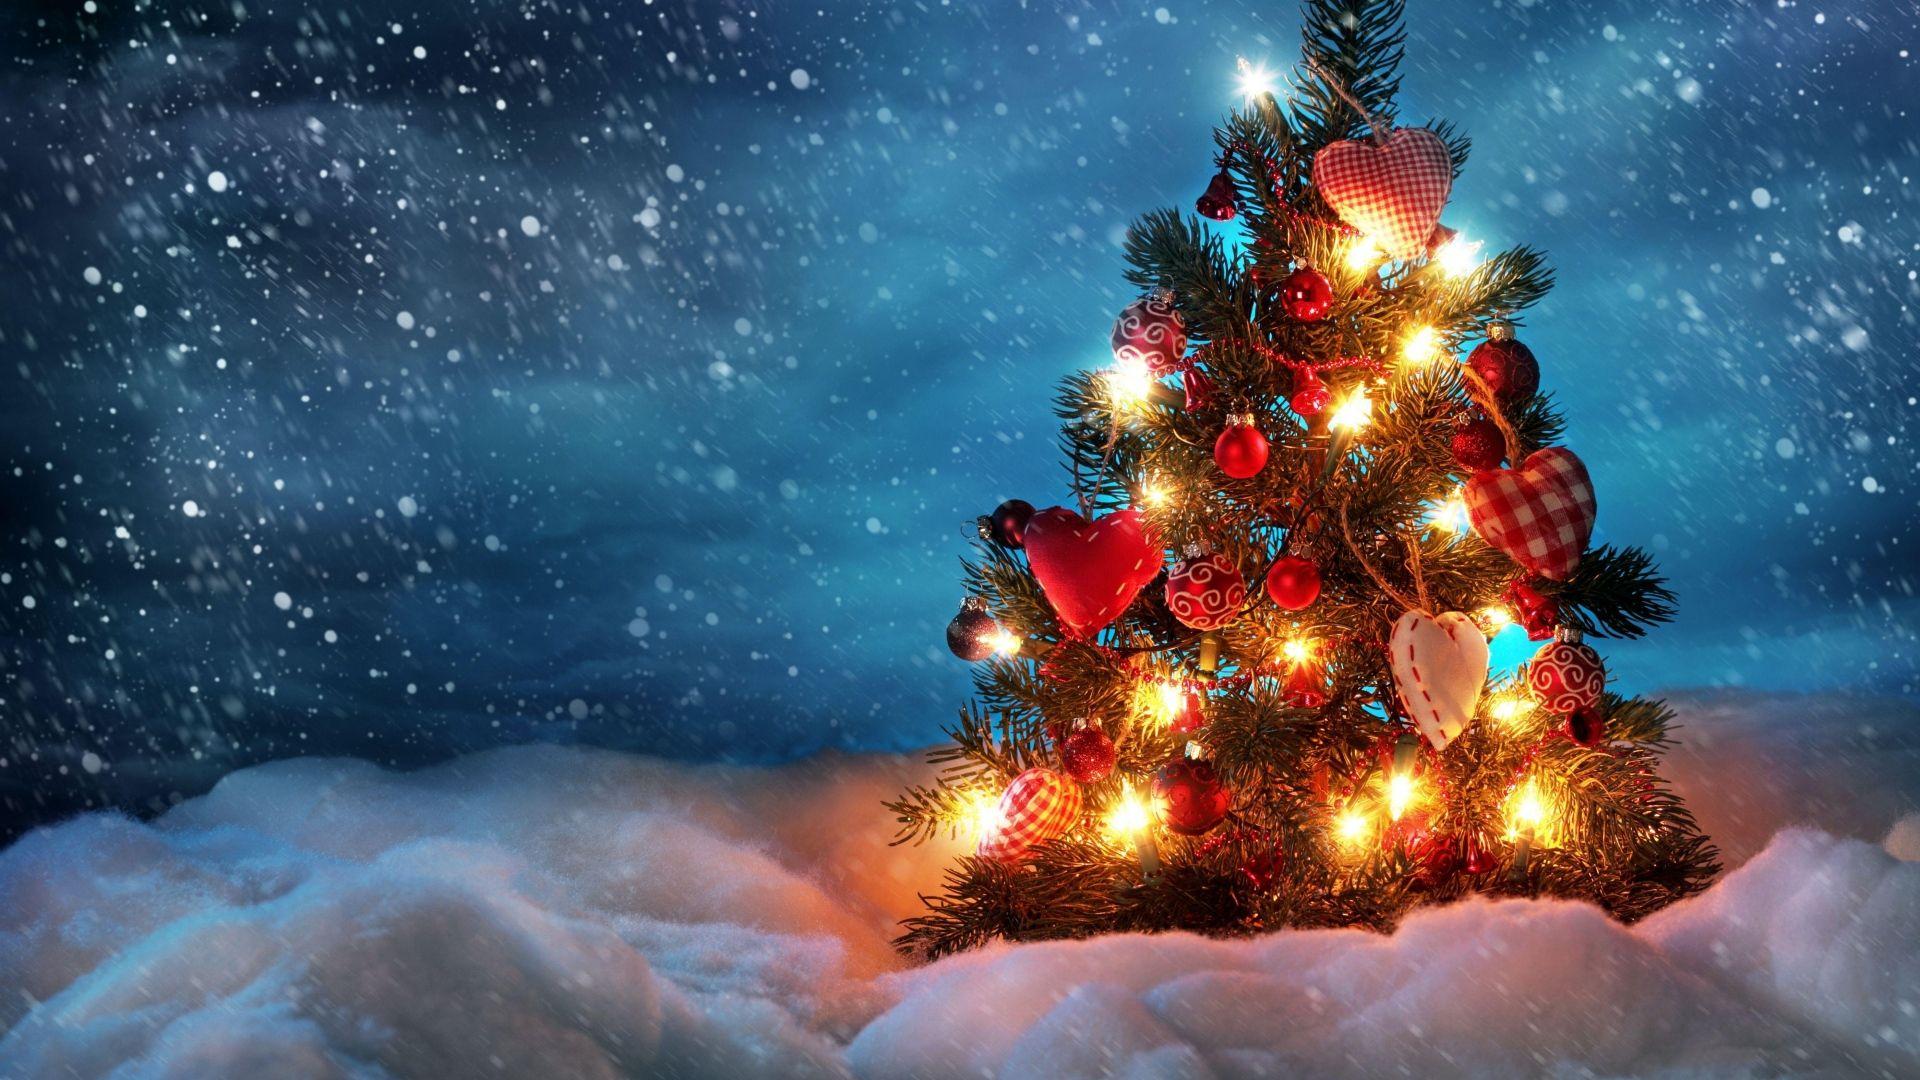 christmaswallpaper1920x1080 Christmas desktop